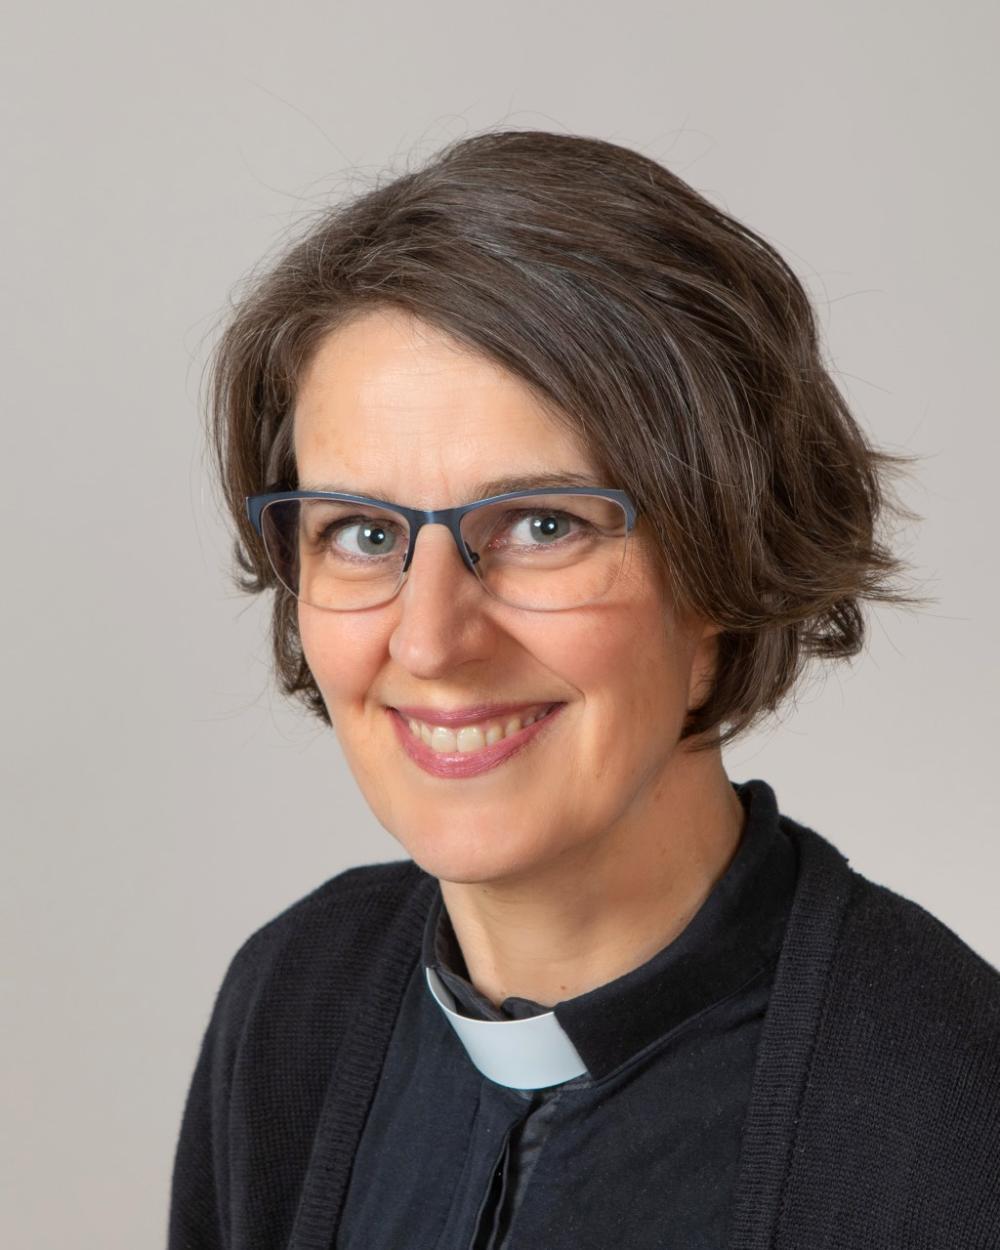 Laura Maria Latikka